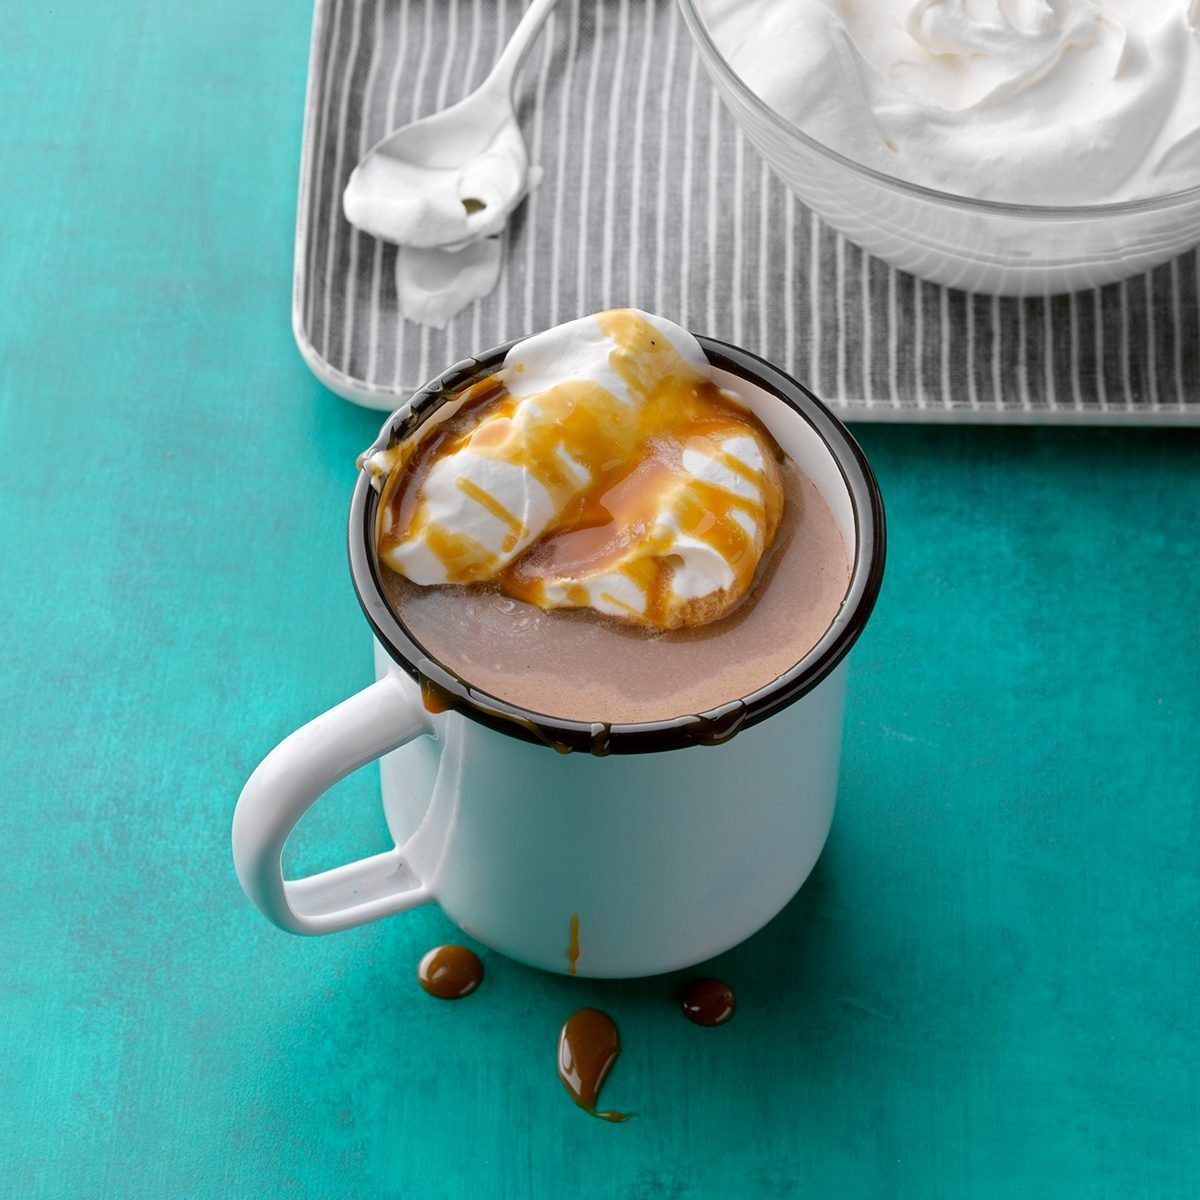 Salted Caramel & Banana haute chocolate